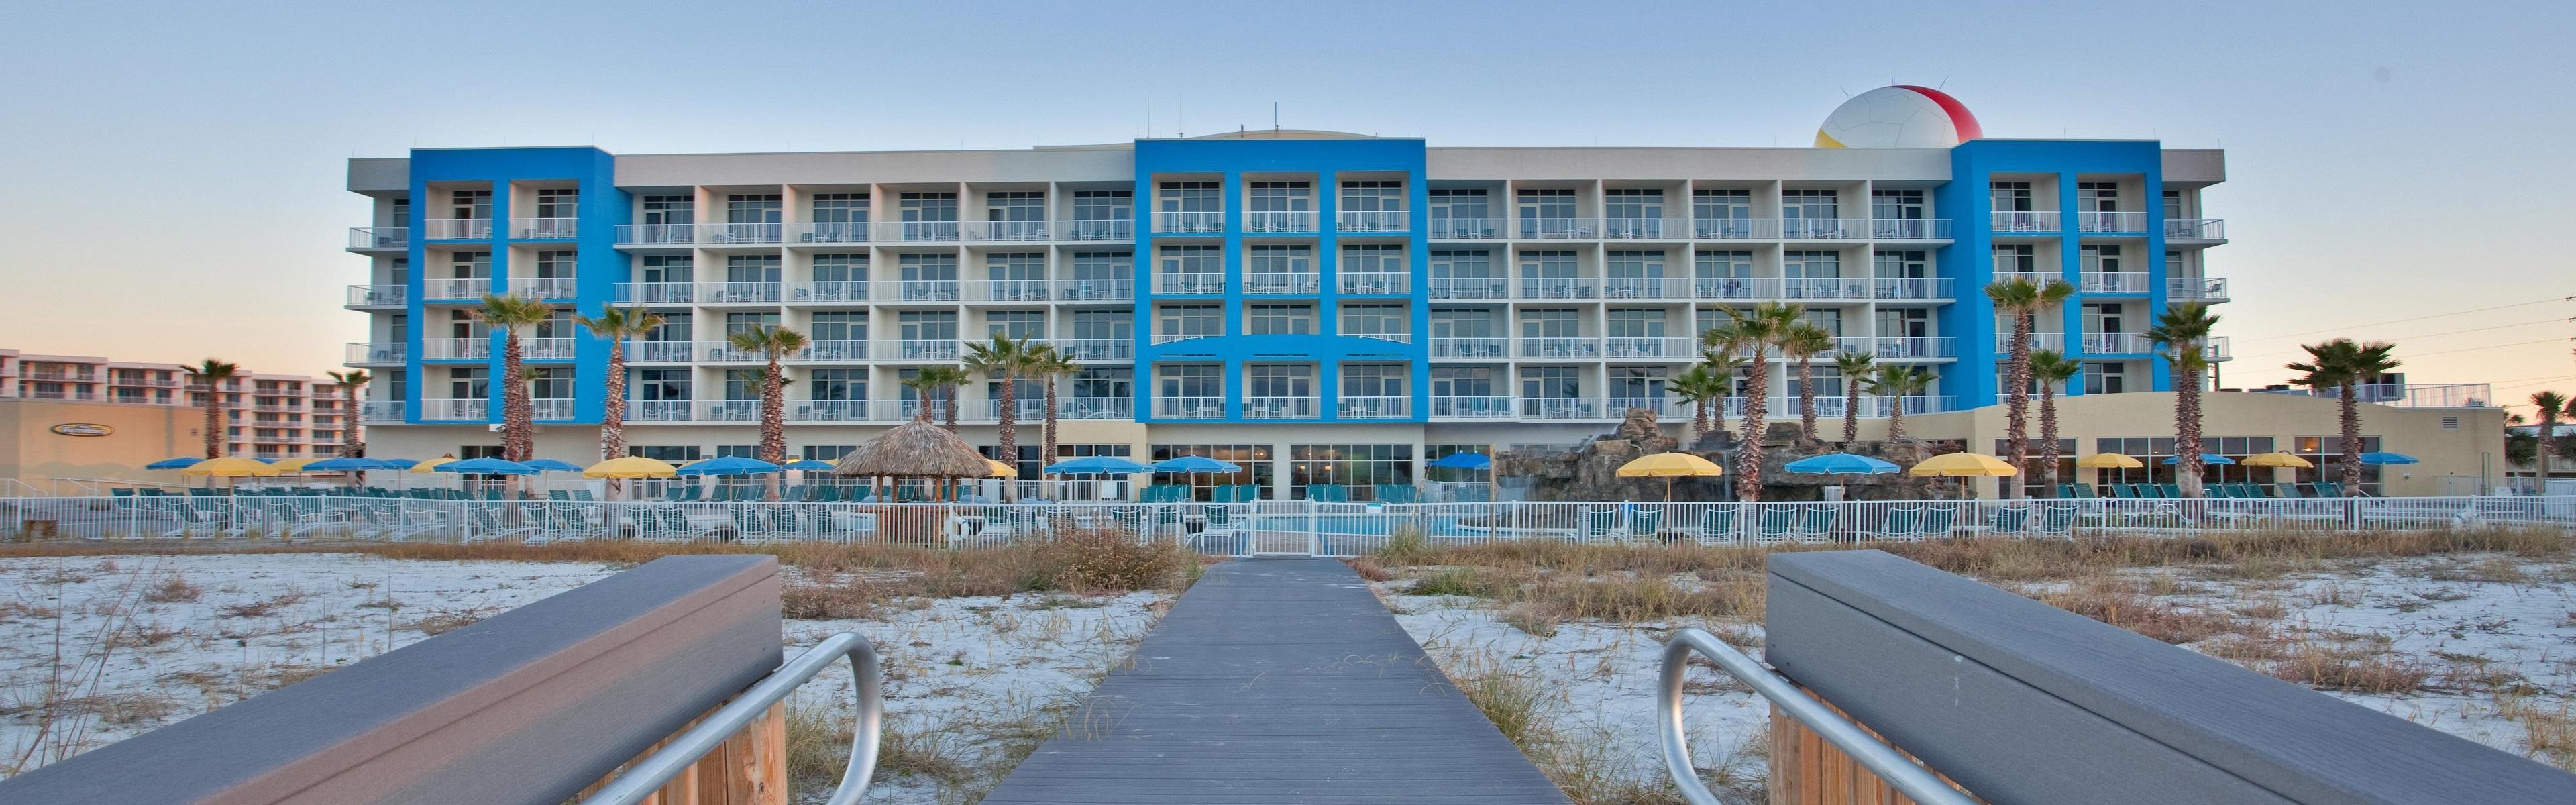 Motels Destin Florida Area